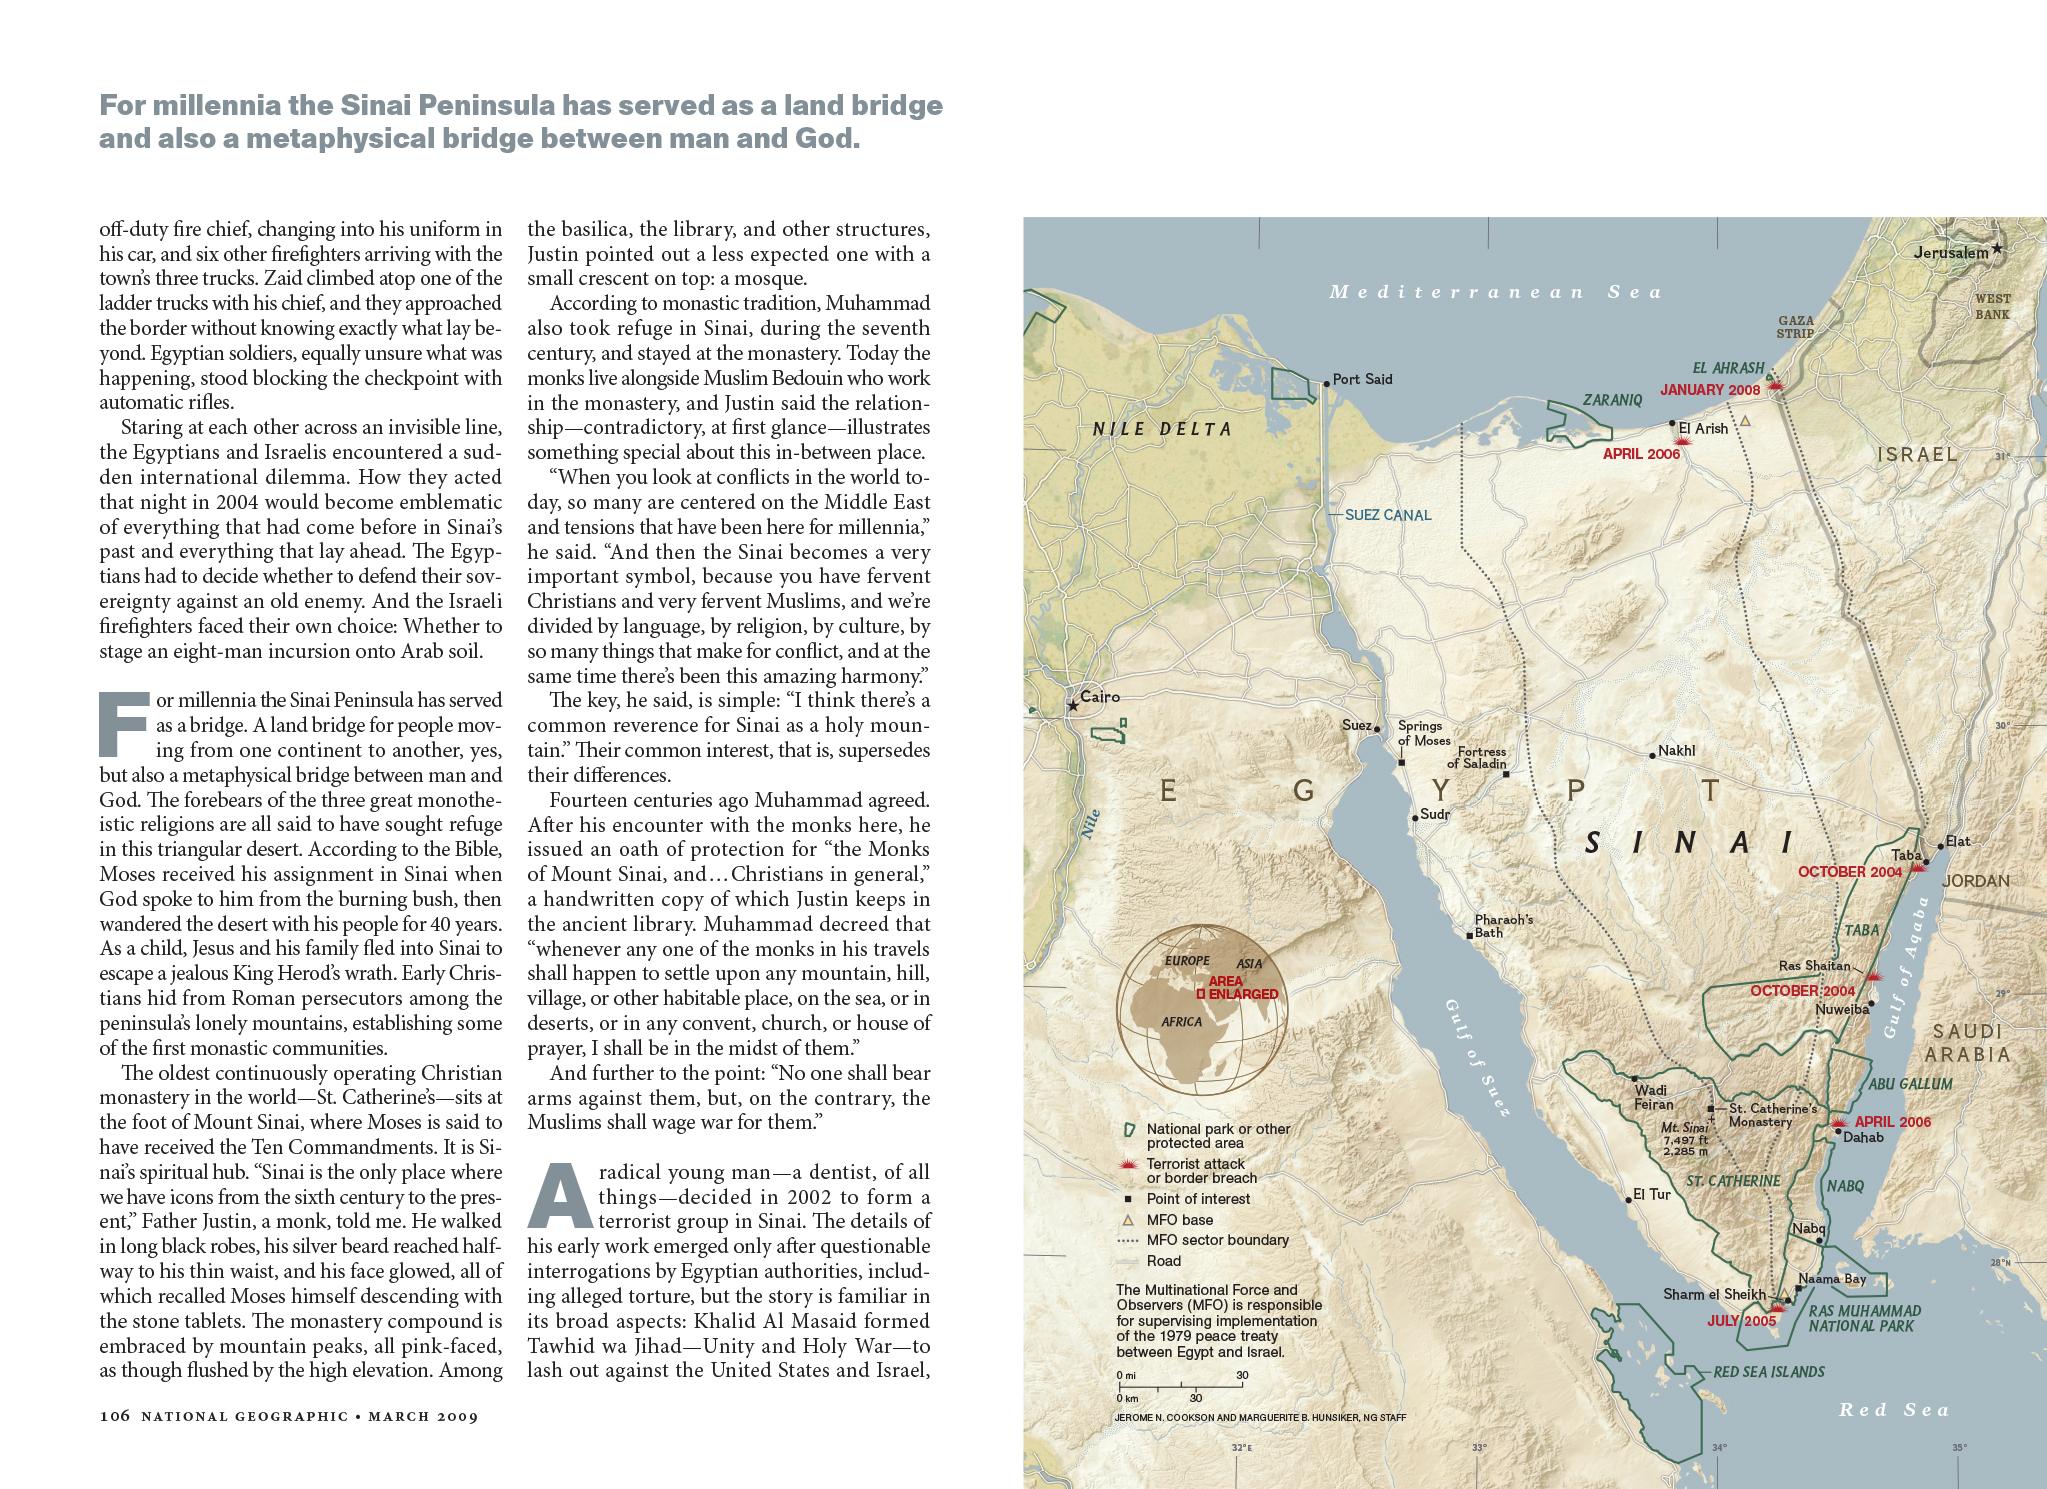 Sinai MM7615-5.jpg